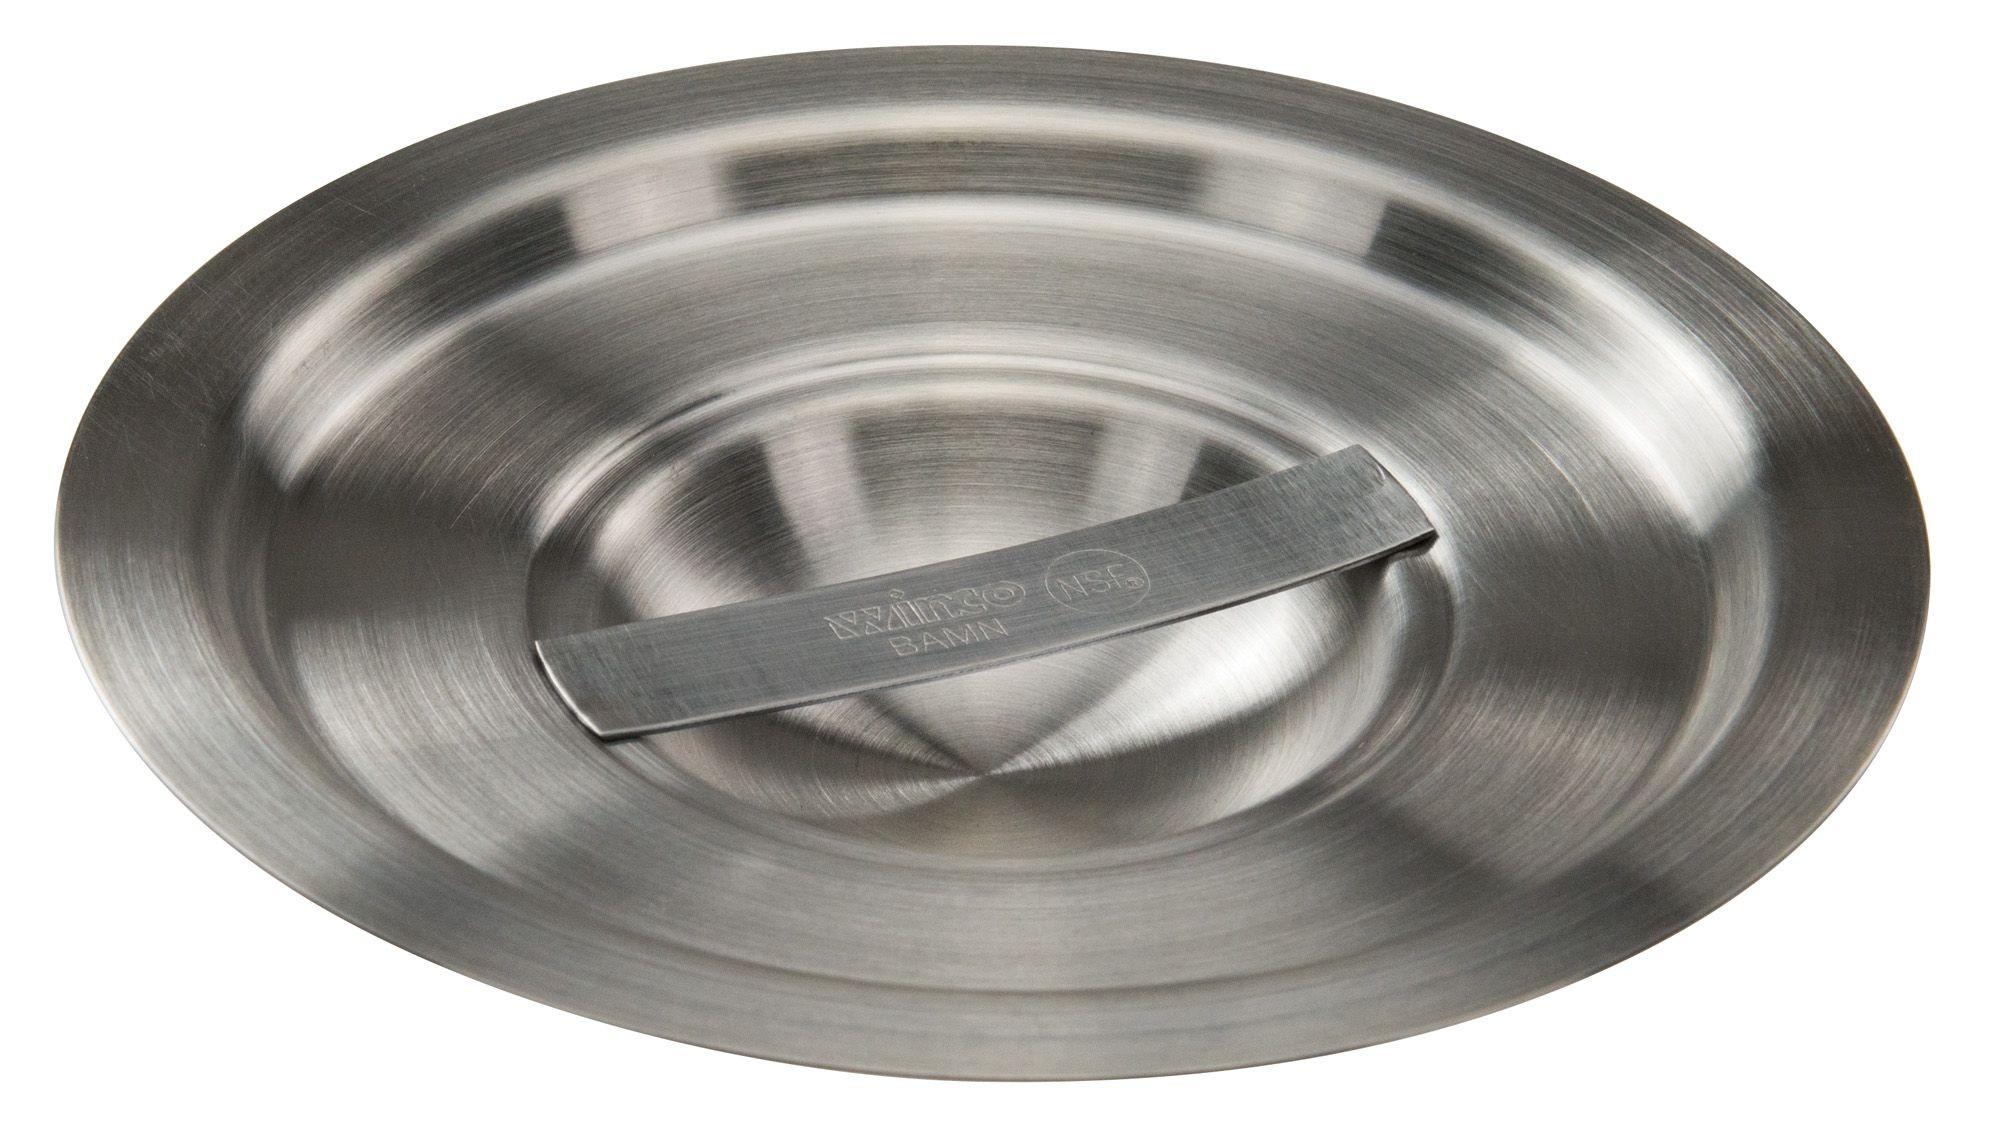 Winco BAMC-2 Stainless Steel Cover for 2 Qt. Bain Marie